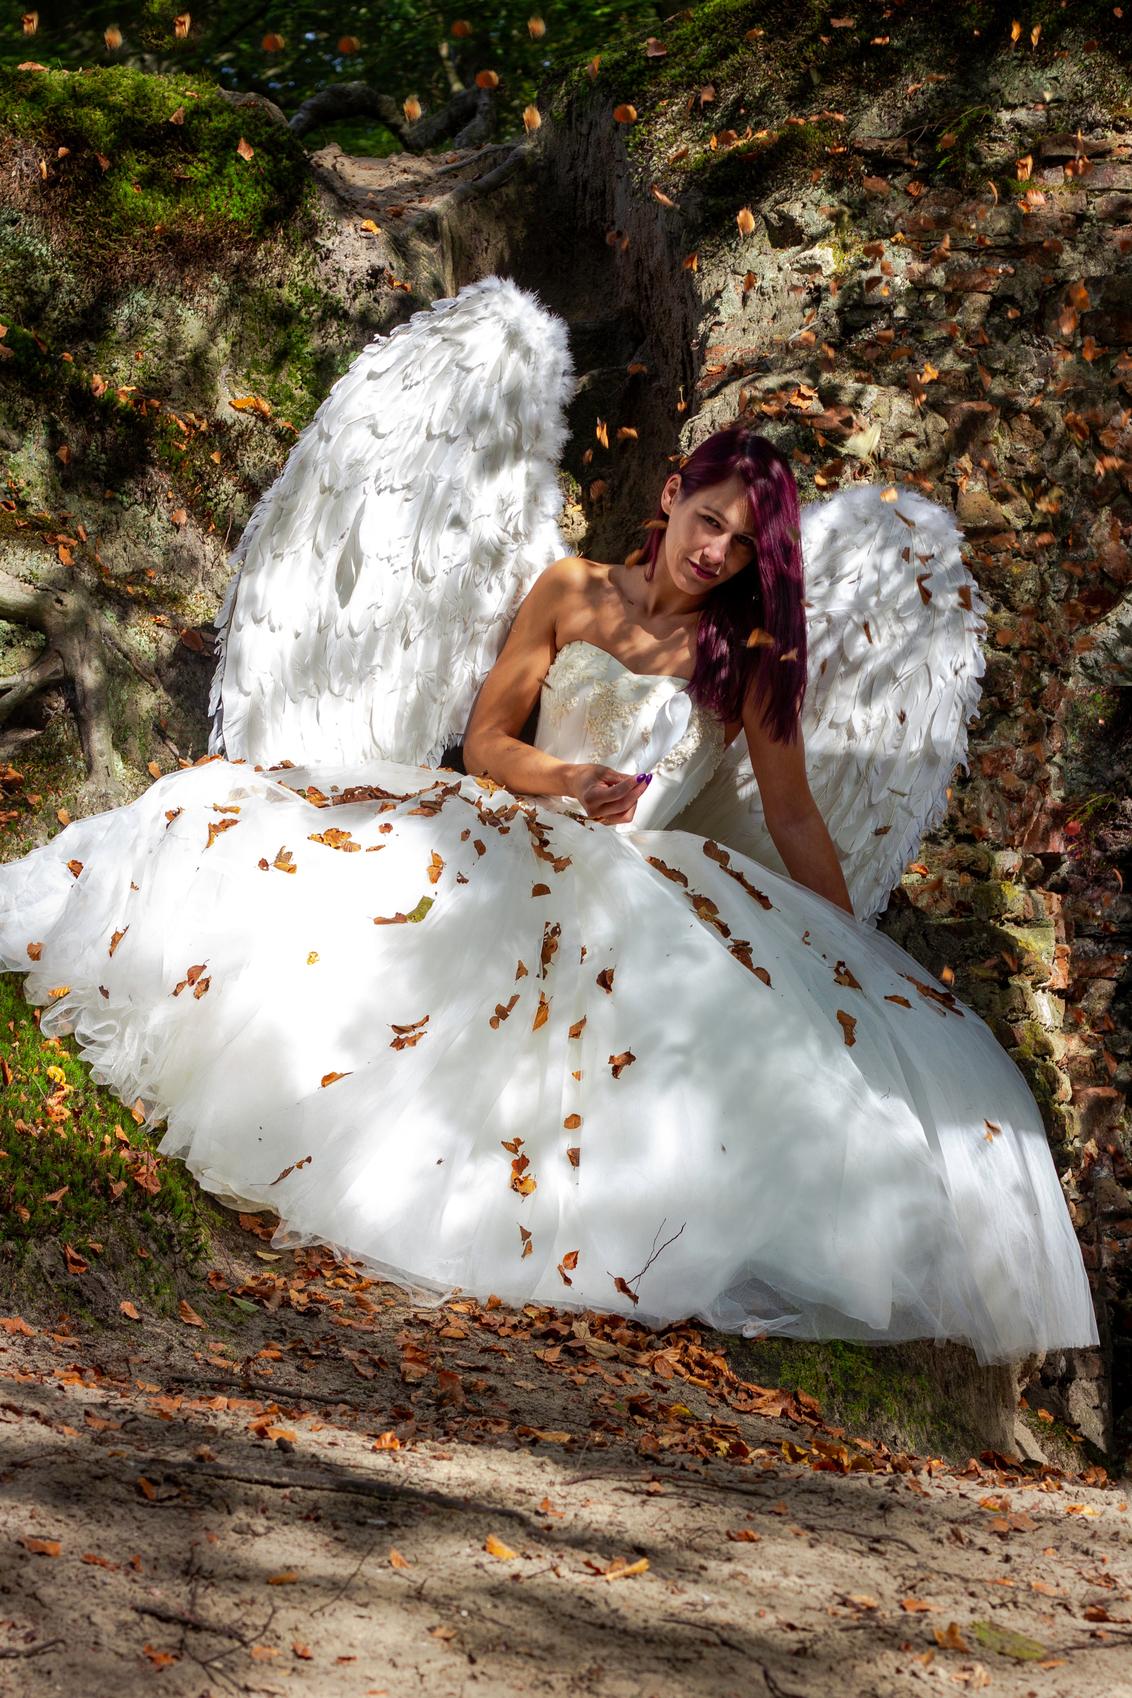 autumn is comming! - autumn is comming! Model: Angelique edit by: Me mverbeekfotografie.nl - foto door frmike op 15-10-2018 - deze foto bevat: vrouw, kleur, autumn, natuur, licht, herfst, portret, model, bos, flits, haar, fashion, meisje, beauty, sfeer, pose, glamour, photoshop, belichting, expressie, jurk, blaadjes, mode, fotoshoot, fall, kleding, romantisch, locatie, makeup, commercial, styling, strobist, lightroom, fashionfotografie